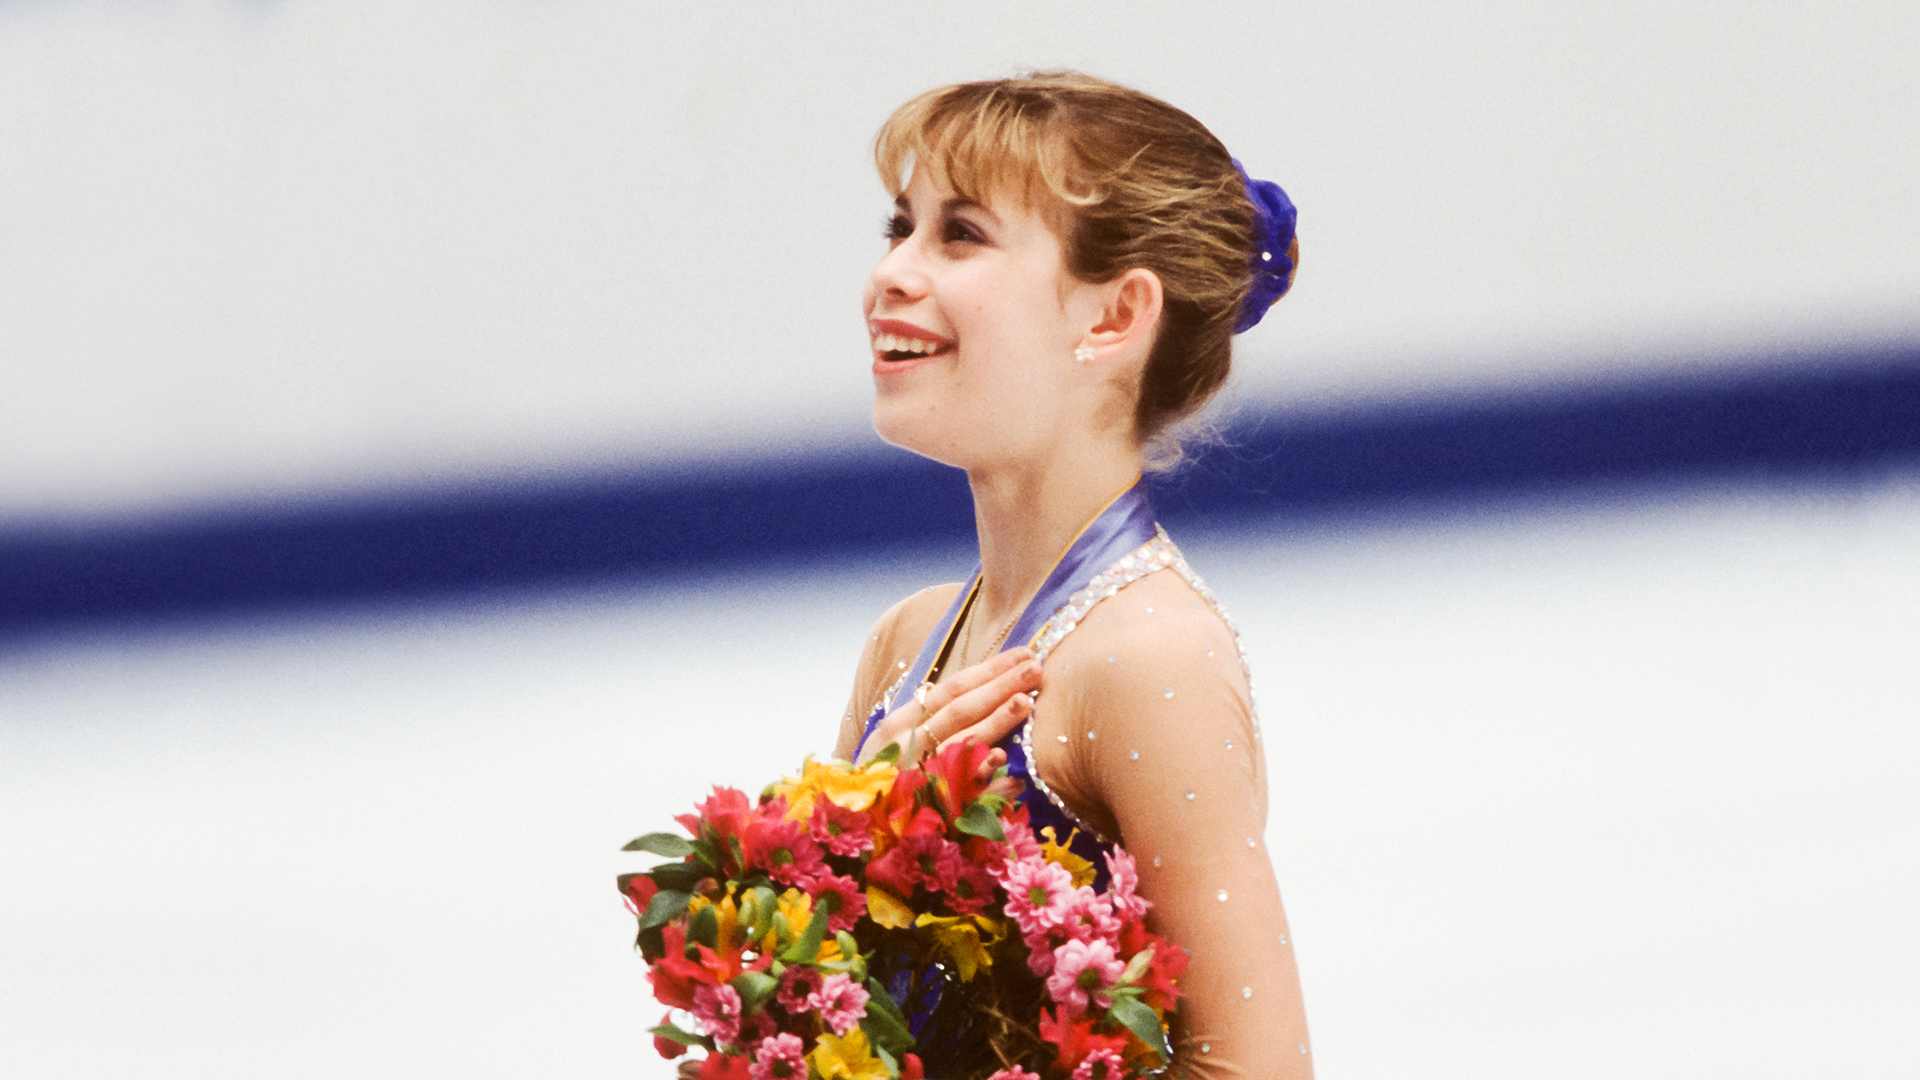 February 20, 1998: Tara Lipinski Became the Youngest Ladies Figure Skating Gold Medalist